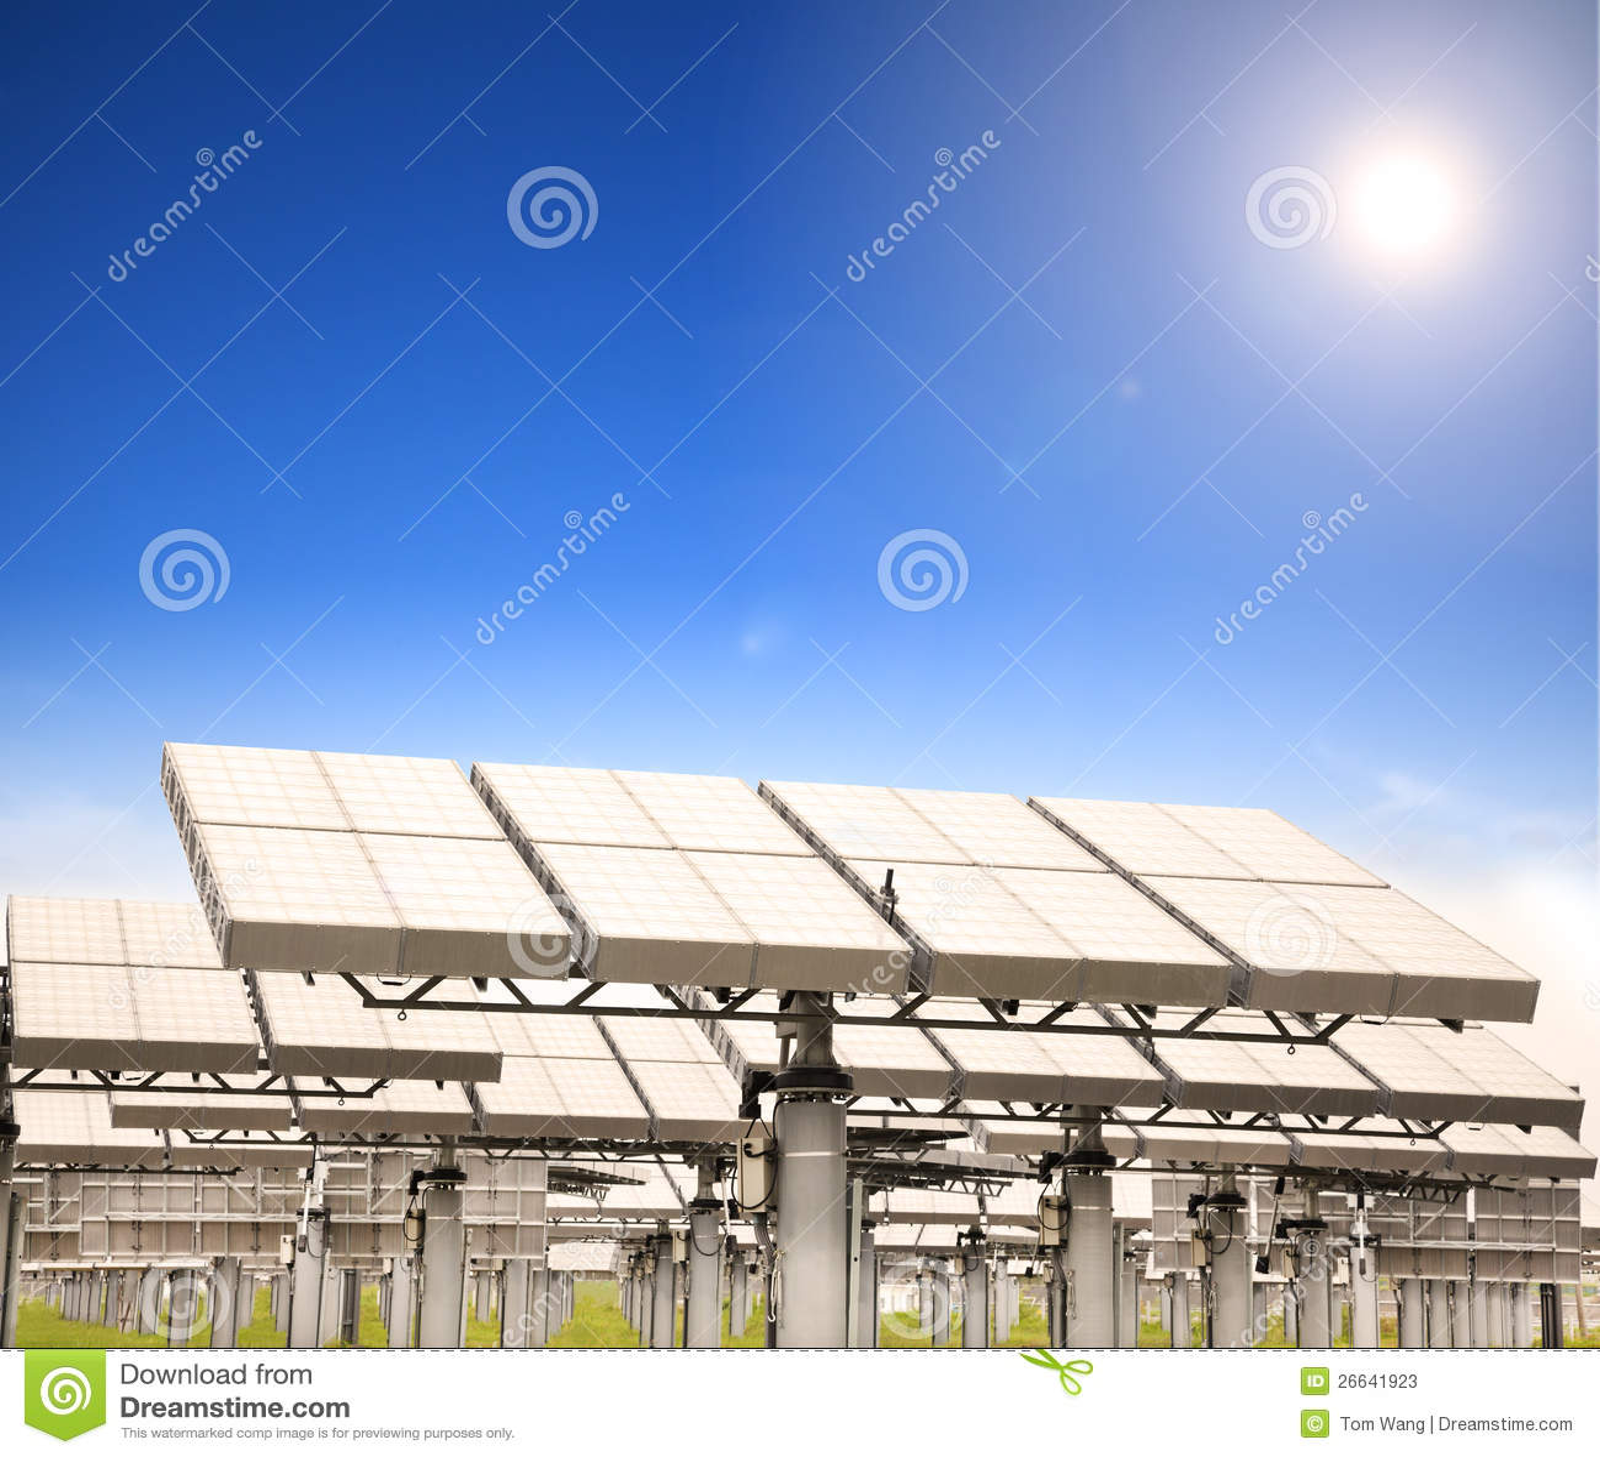 sun tracking solar panel pdf